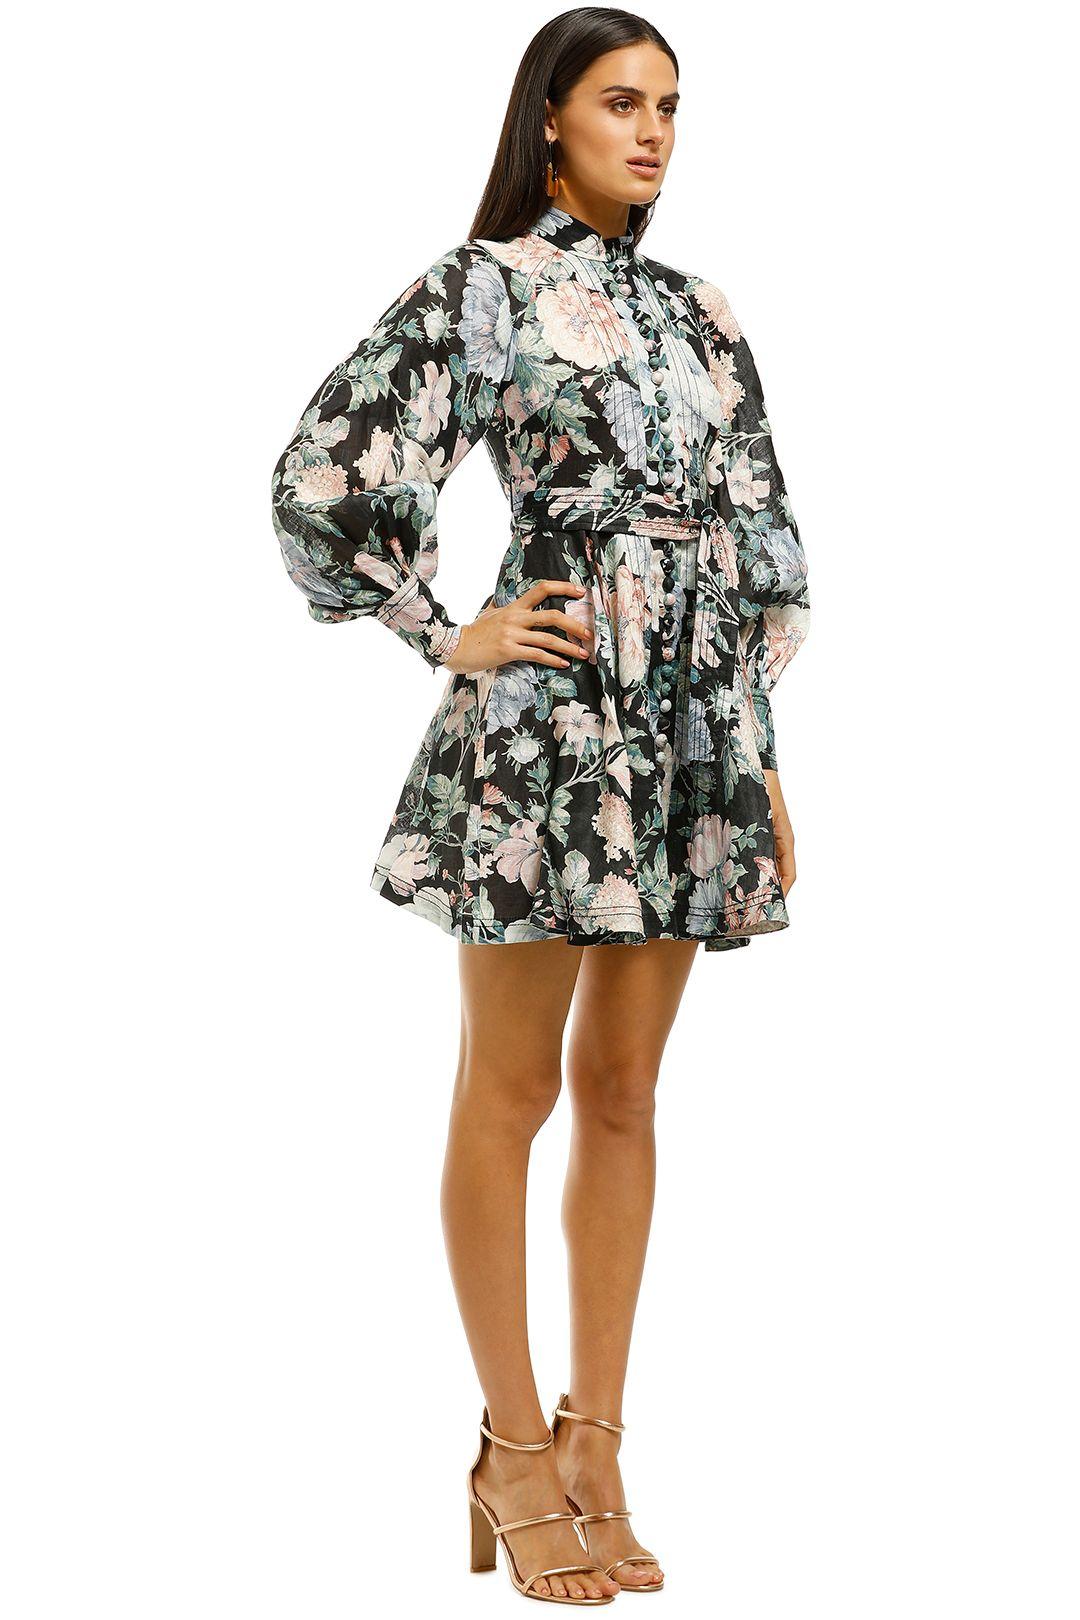 Zimmermann-Verity-Rouleau-Short-Dress-Black-Floral-Side